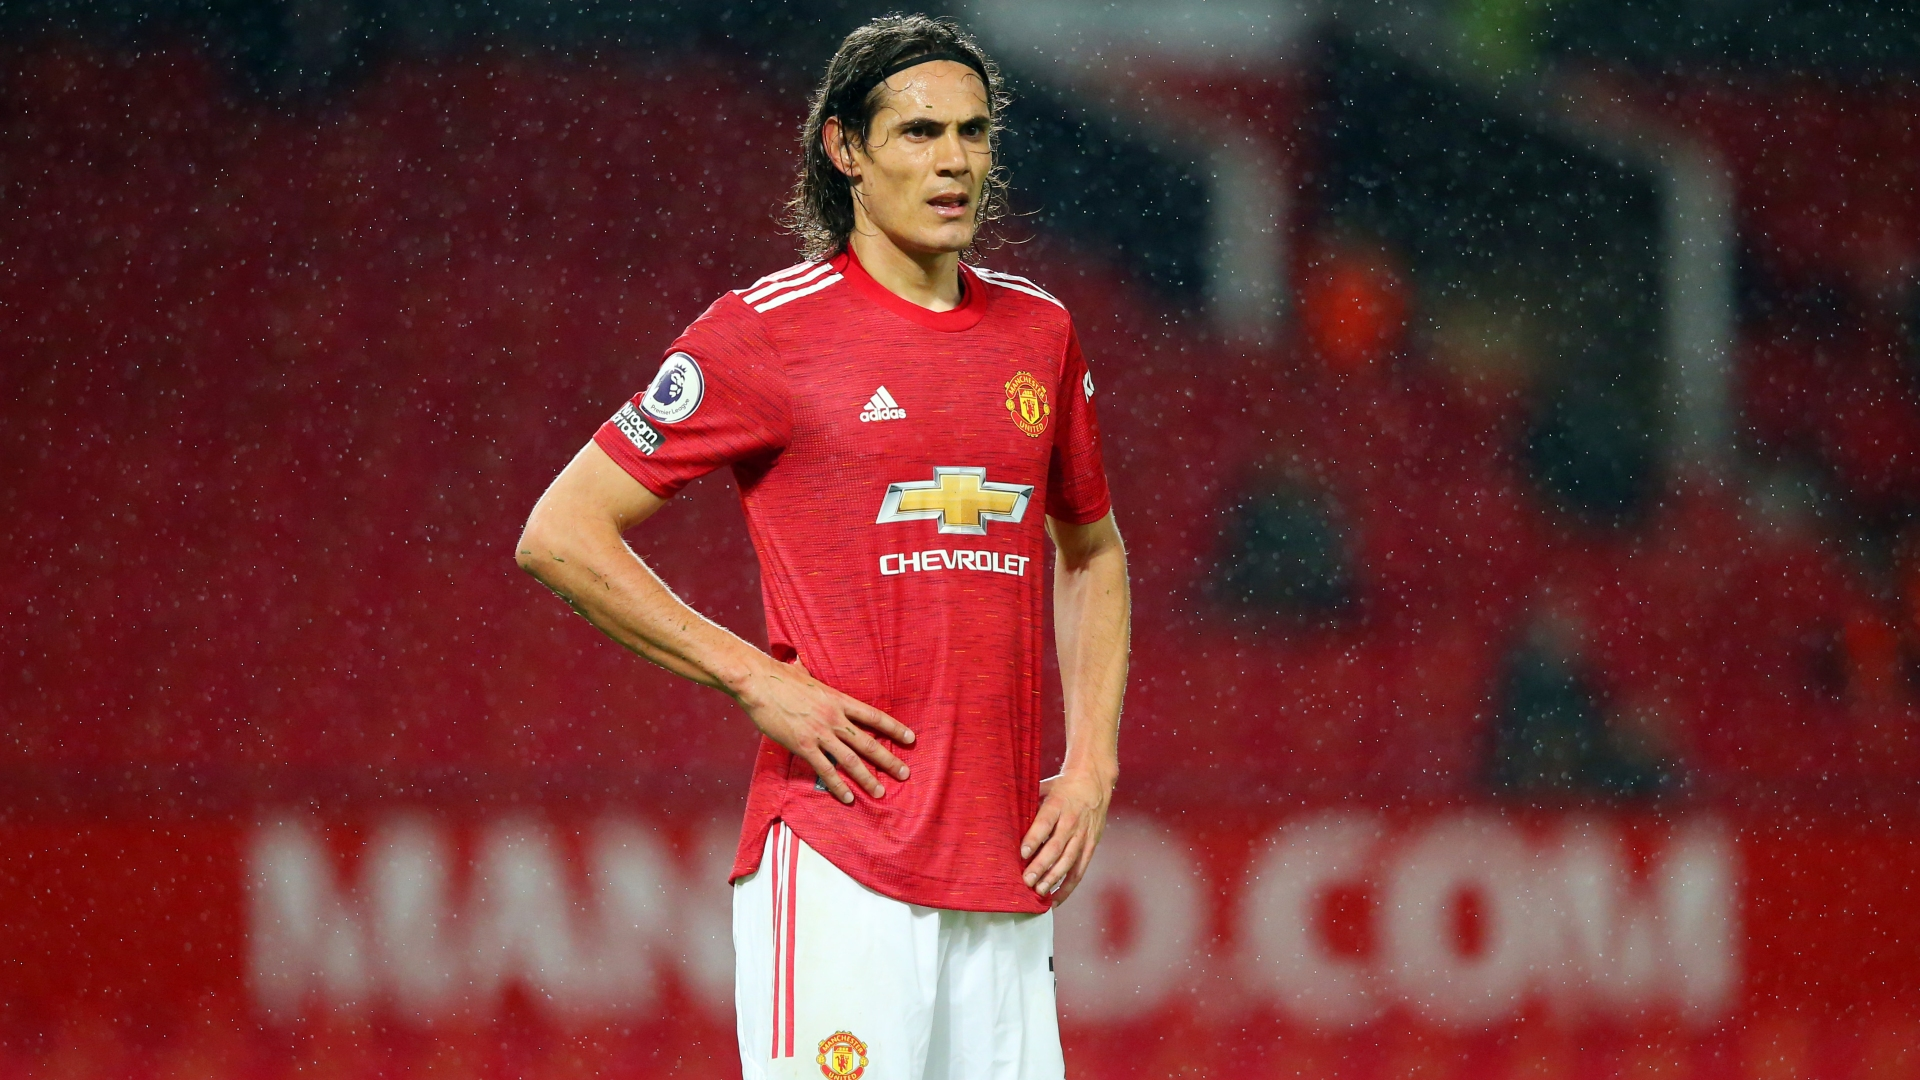 Solskjaer says Cavani must wait to secure regular Man Utd starts